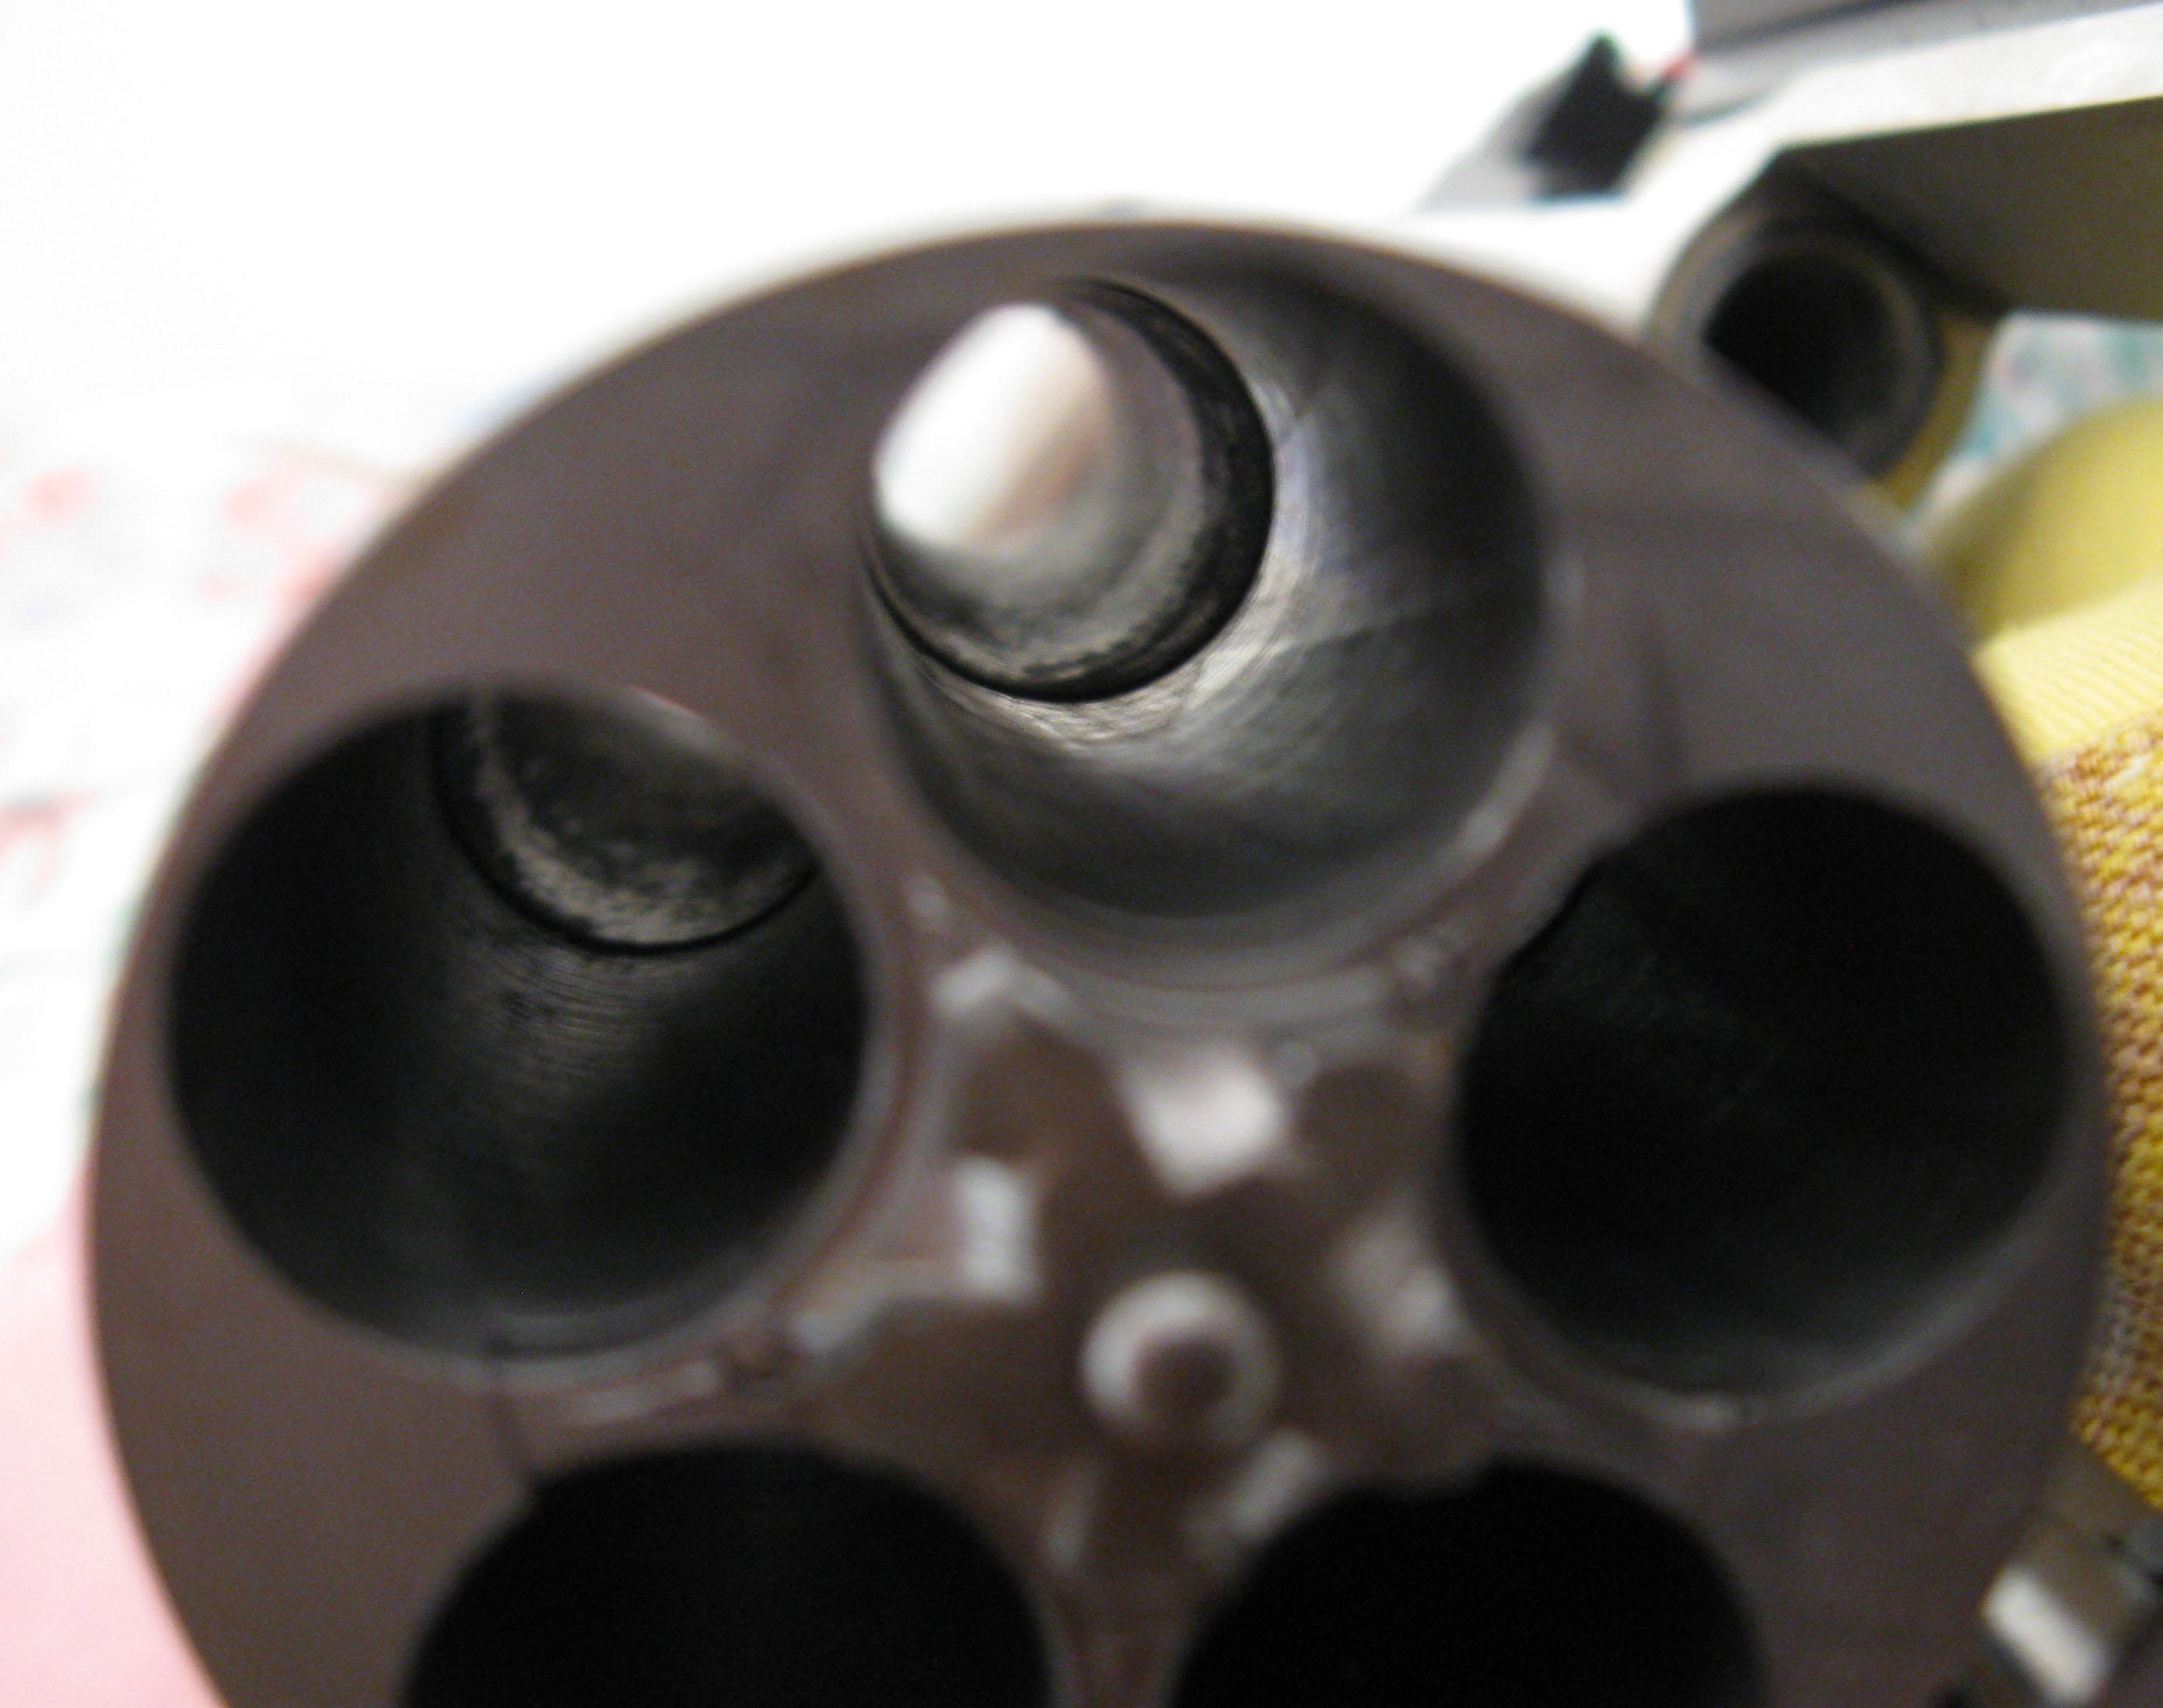 cylinder choke 410 shotshell fit issues